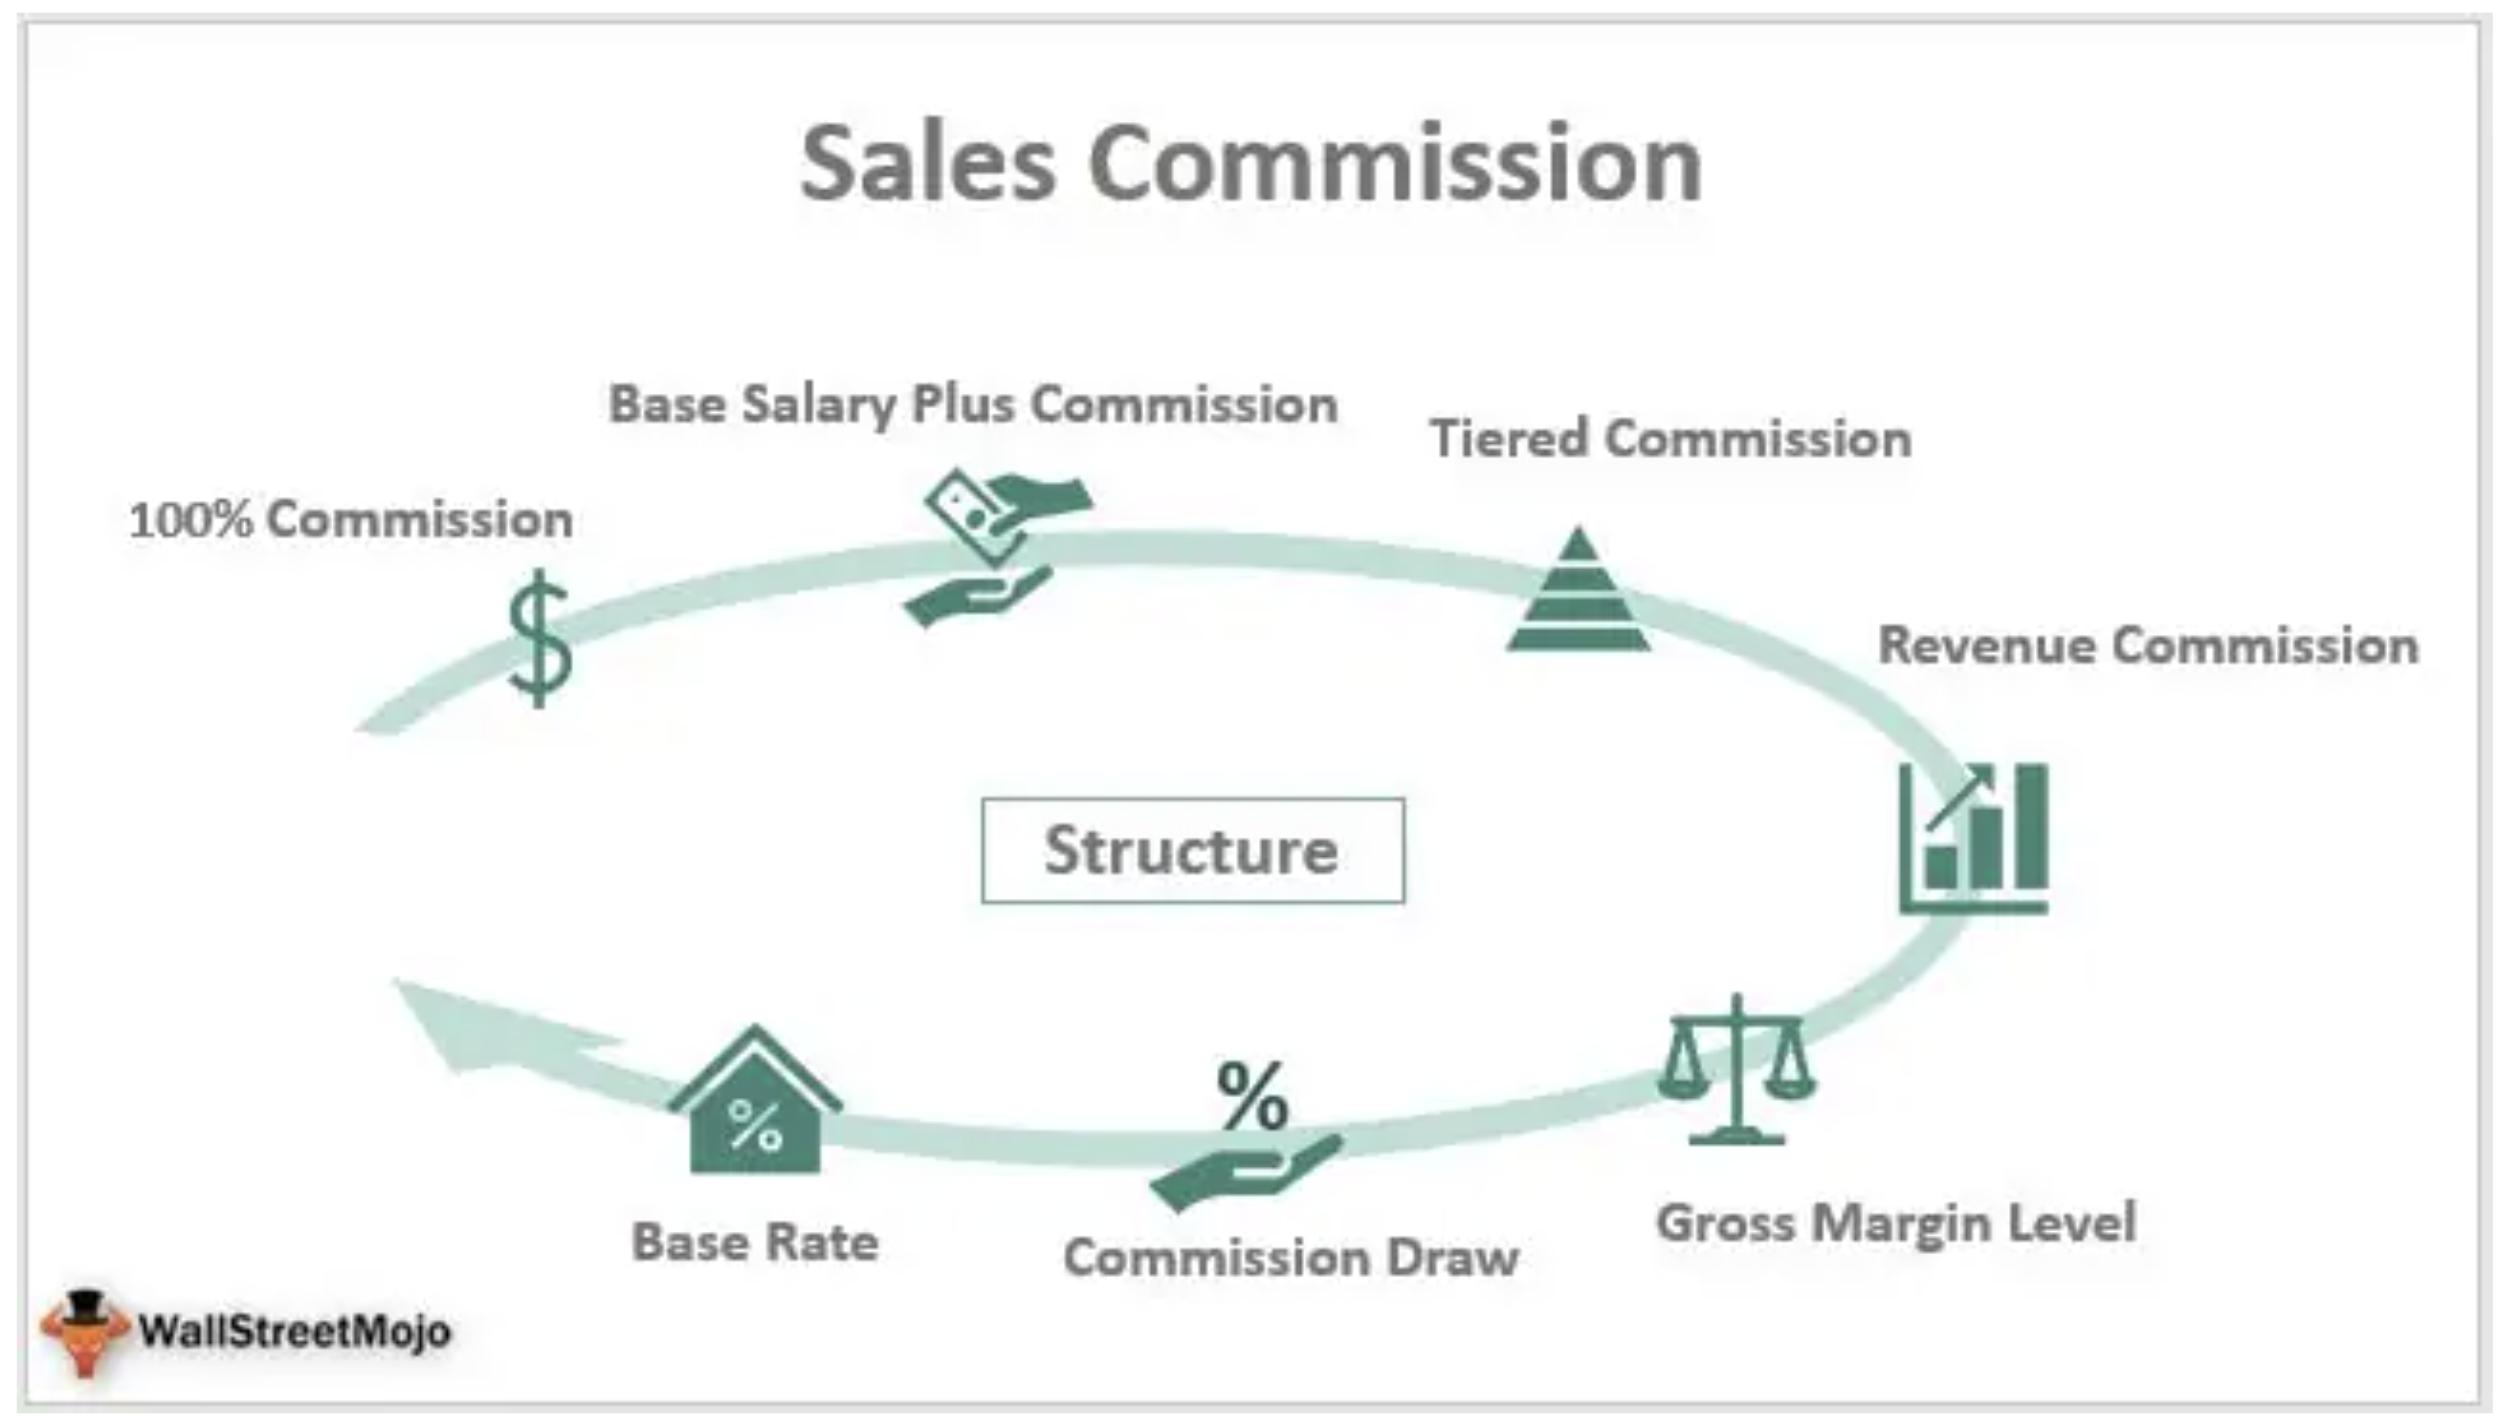 Sales Commission Structures